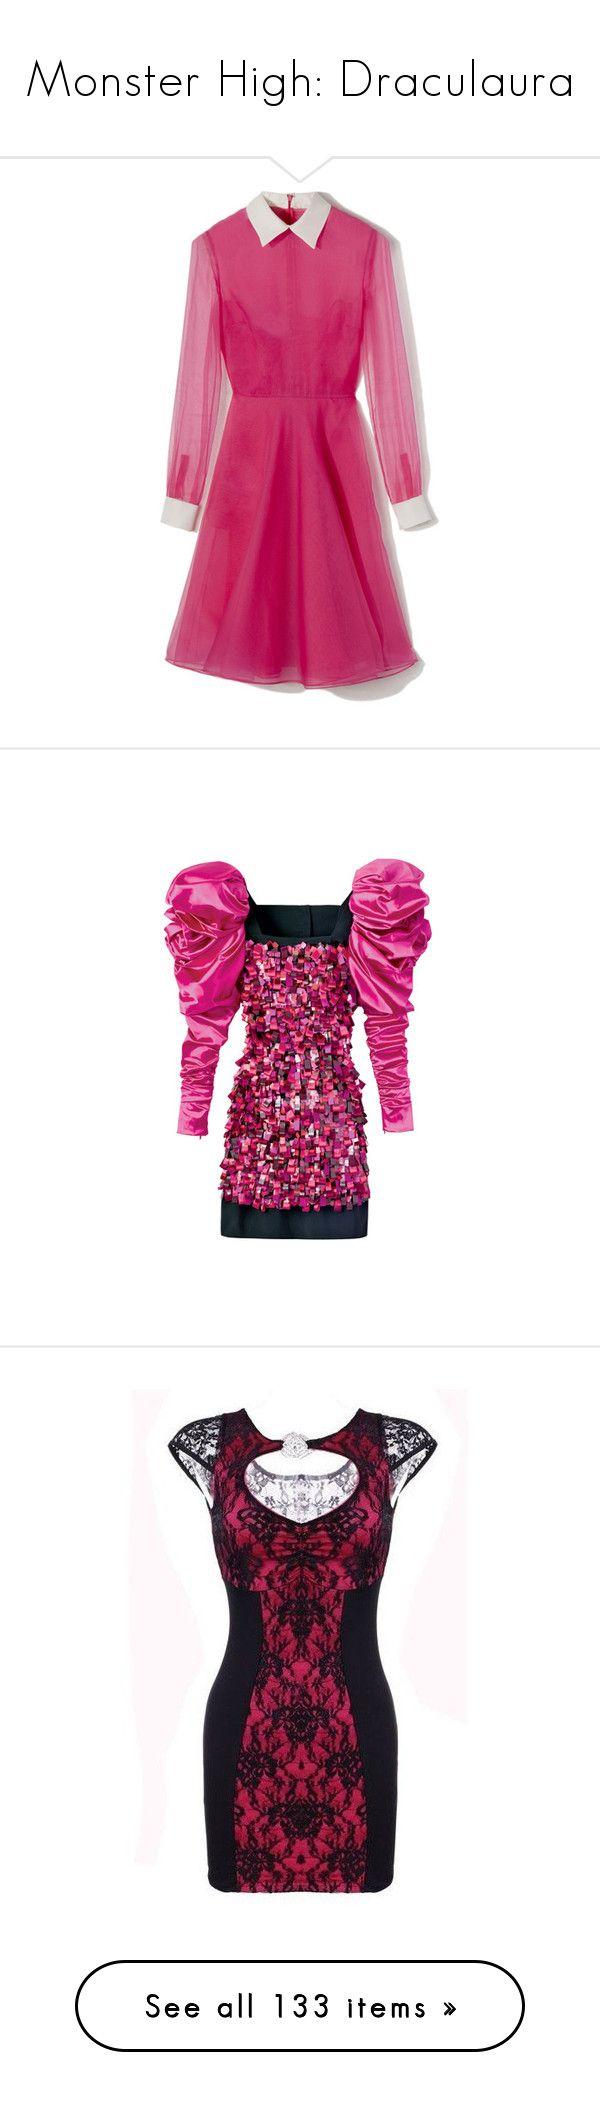 """Monster High: Draculaura"" by jordankayleigh ❤ liked on Polyvore featuring MonsterHigh, draculaura, dresses, vestidos, valentino, pink dress, pink bustier, shirt dress, bustier dress and pink shirt dress"